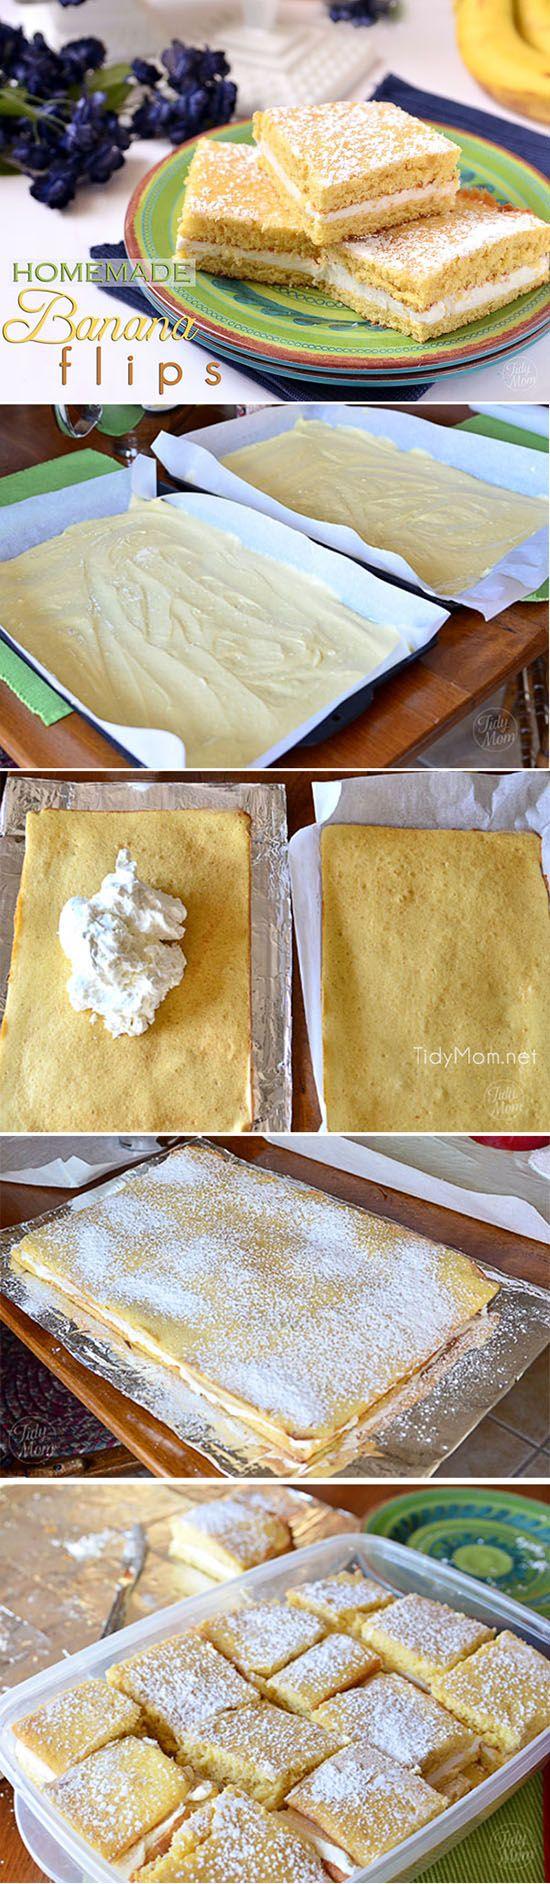 Homemade Banana Flips recipe at TidyMom.net Two moist layers of banana cake with a fluffy banana cream filling.